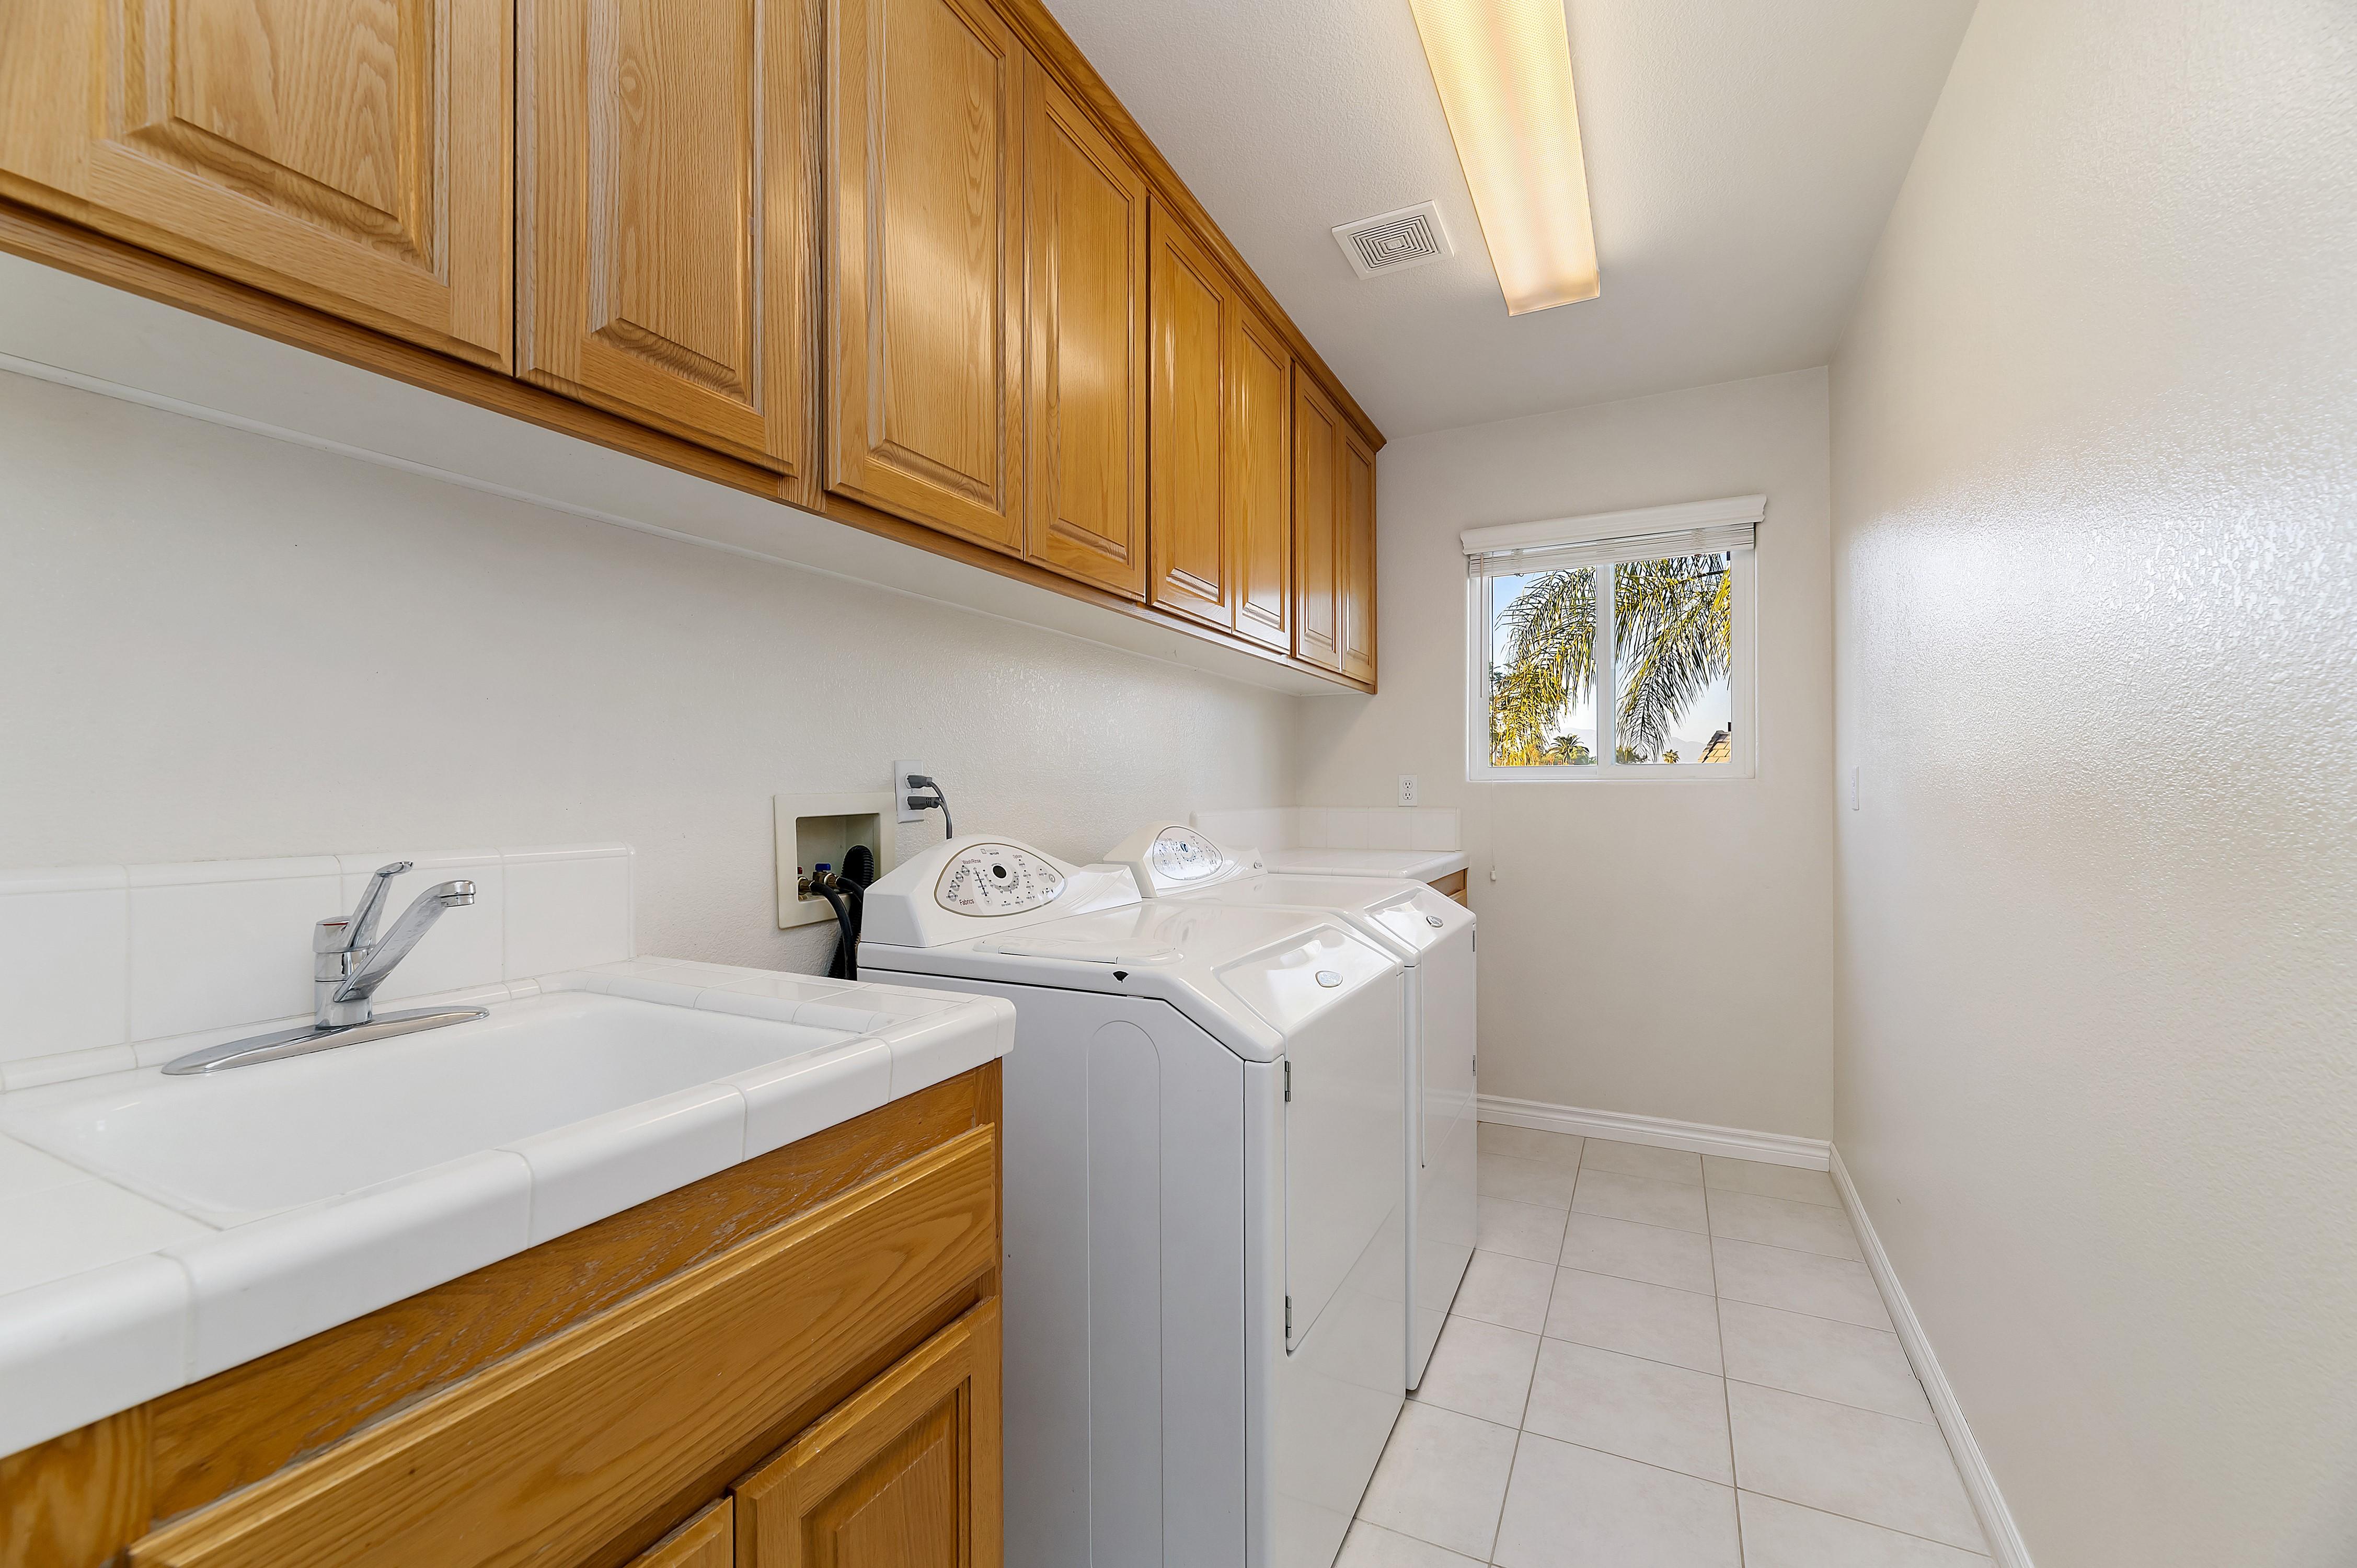 042_Laundry Room